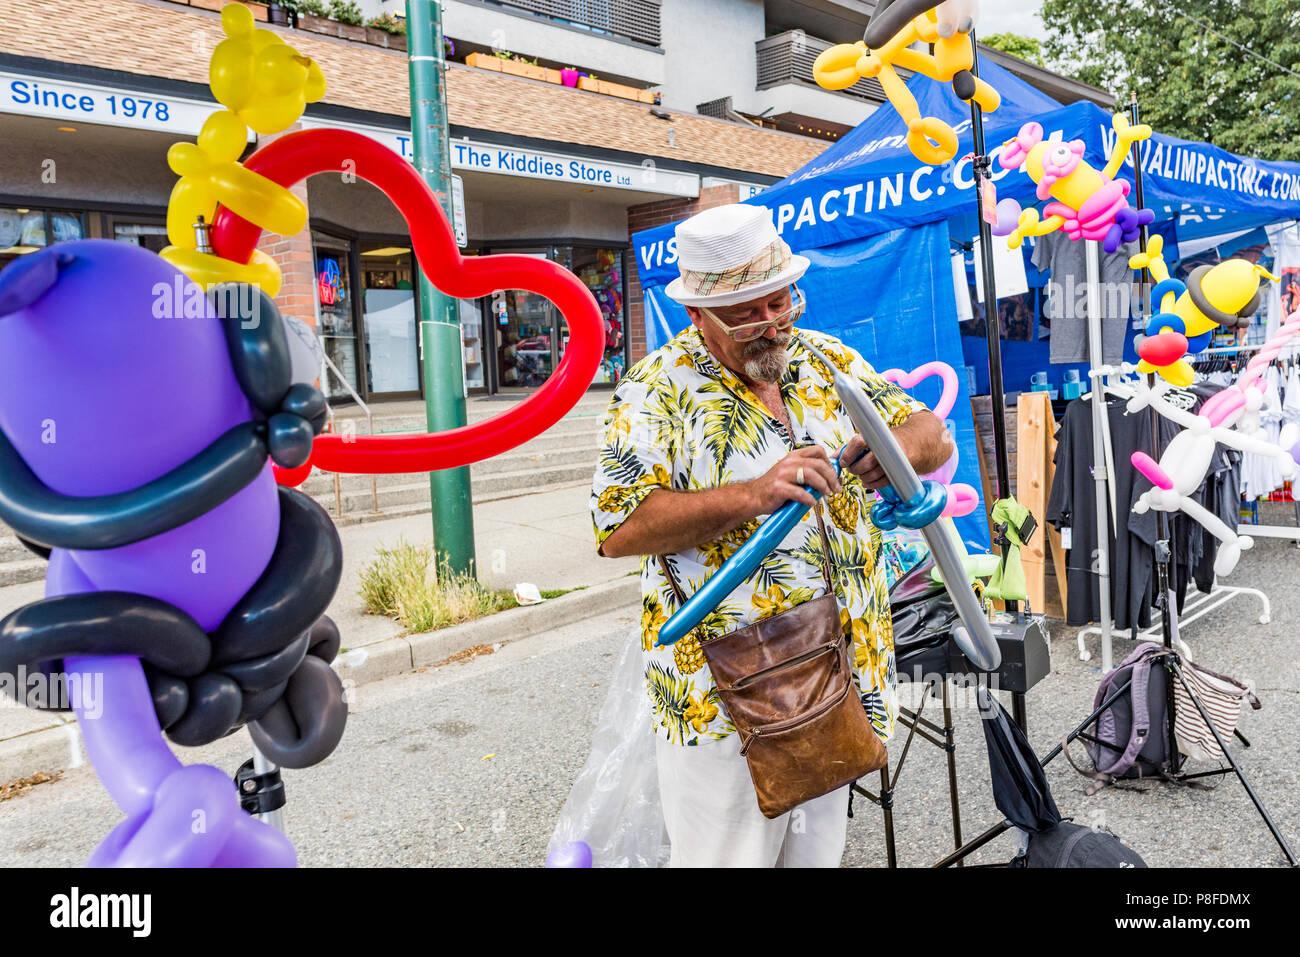 Balloon man, Khatsalano Festival, Kitsilano, Vancouver, British Columbia, Canada. - Stock Image